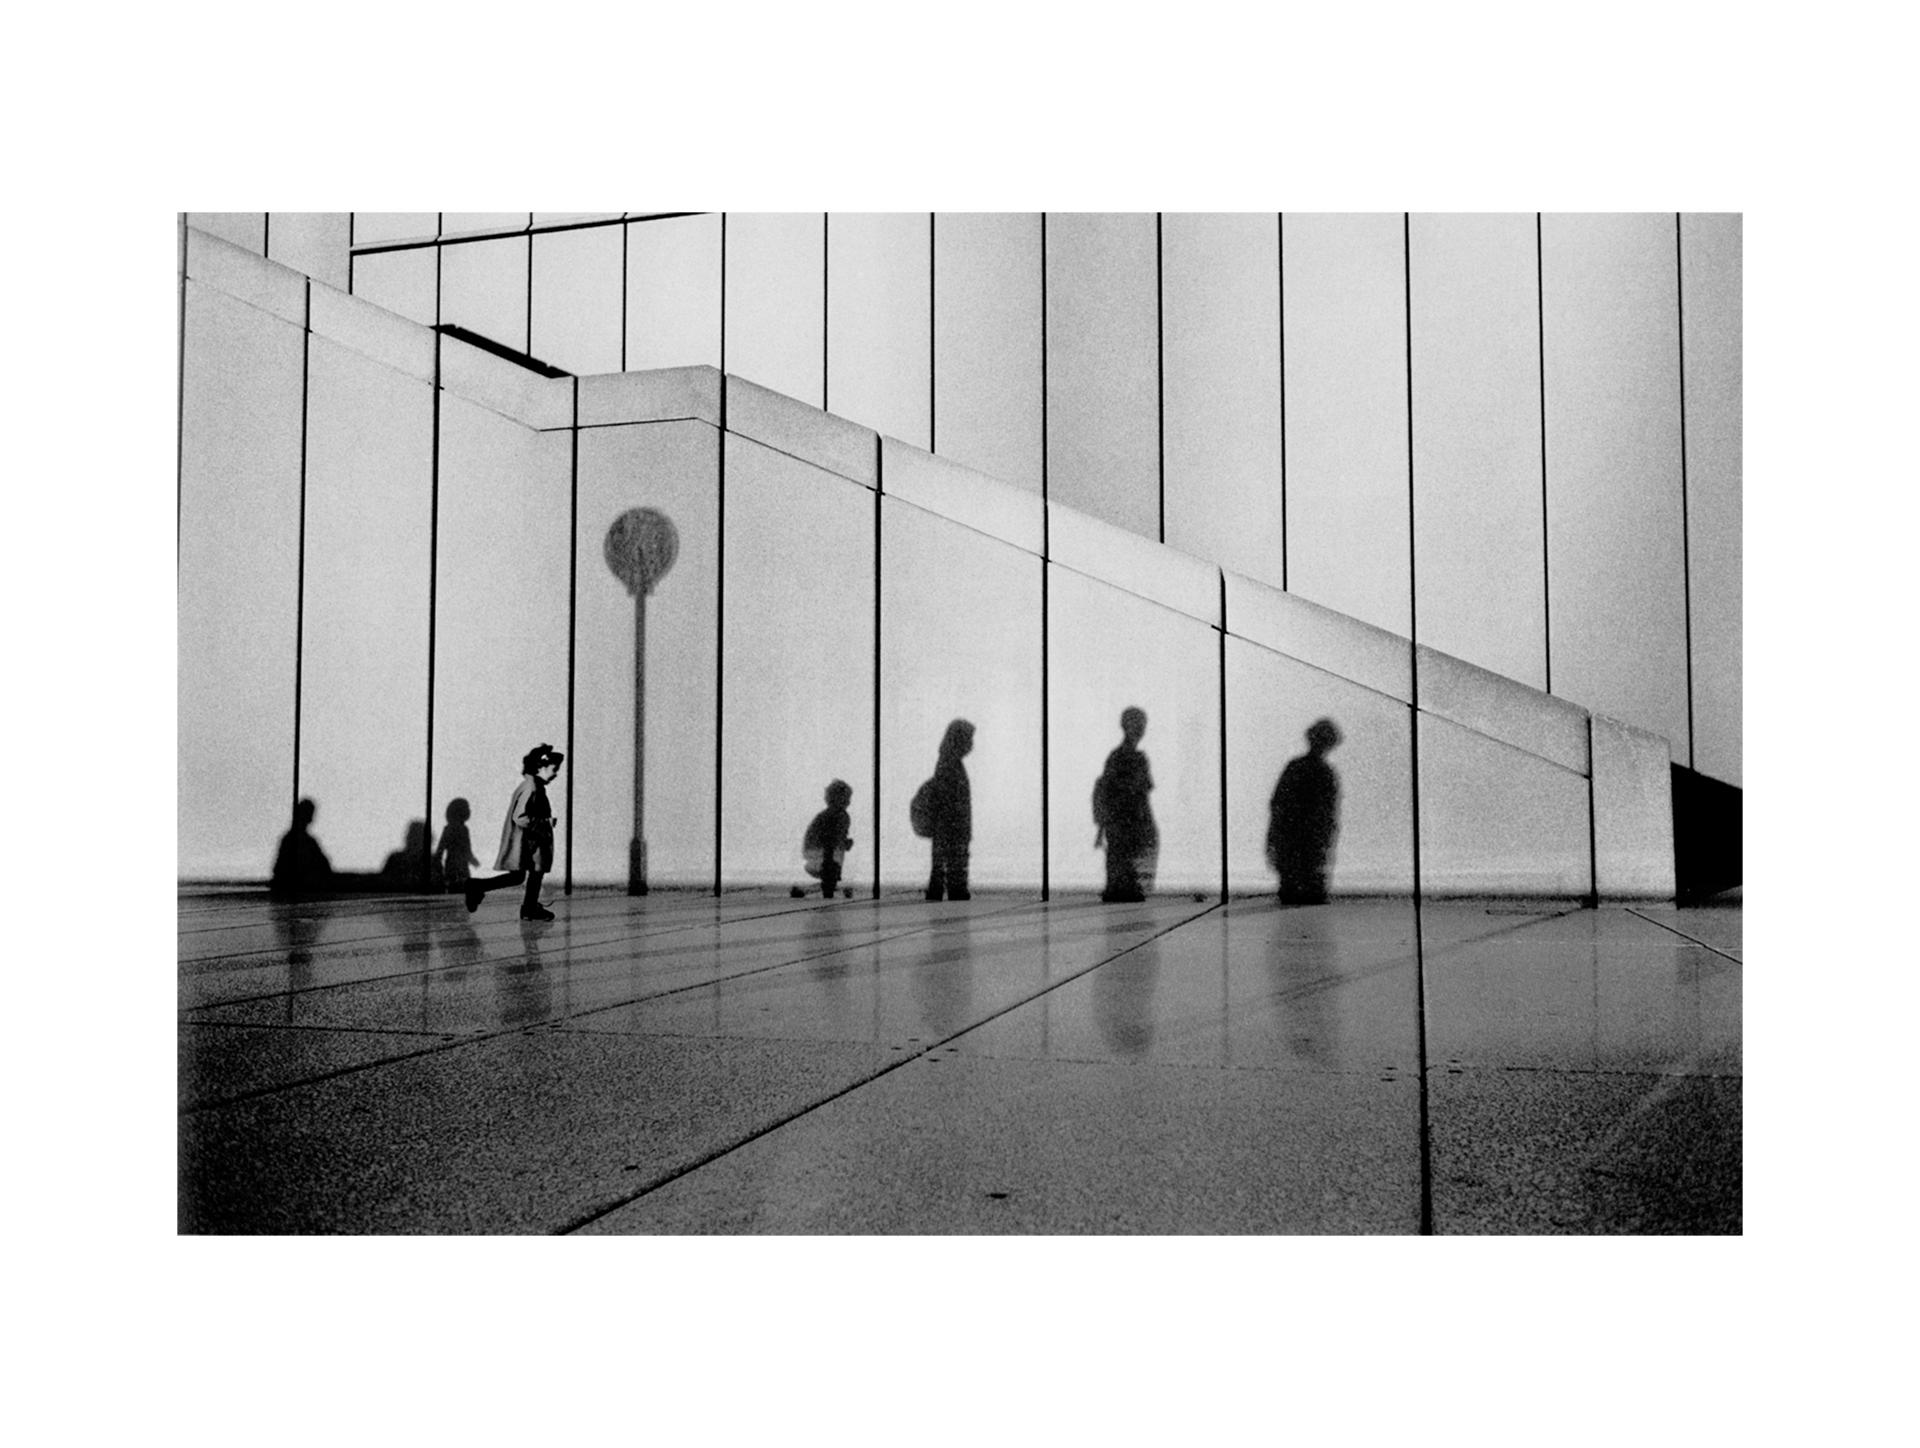 Image of Opera House Shadows, Sydney 2001 by David Peat